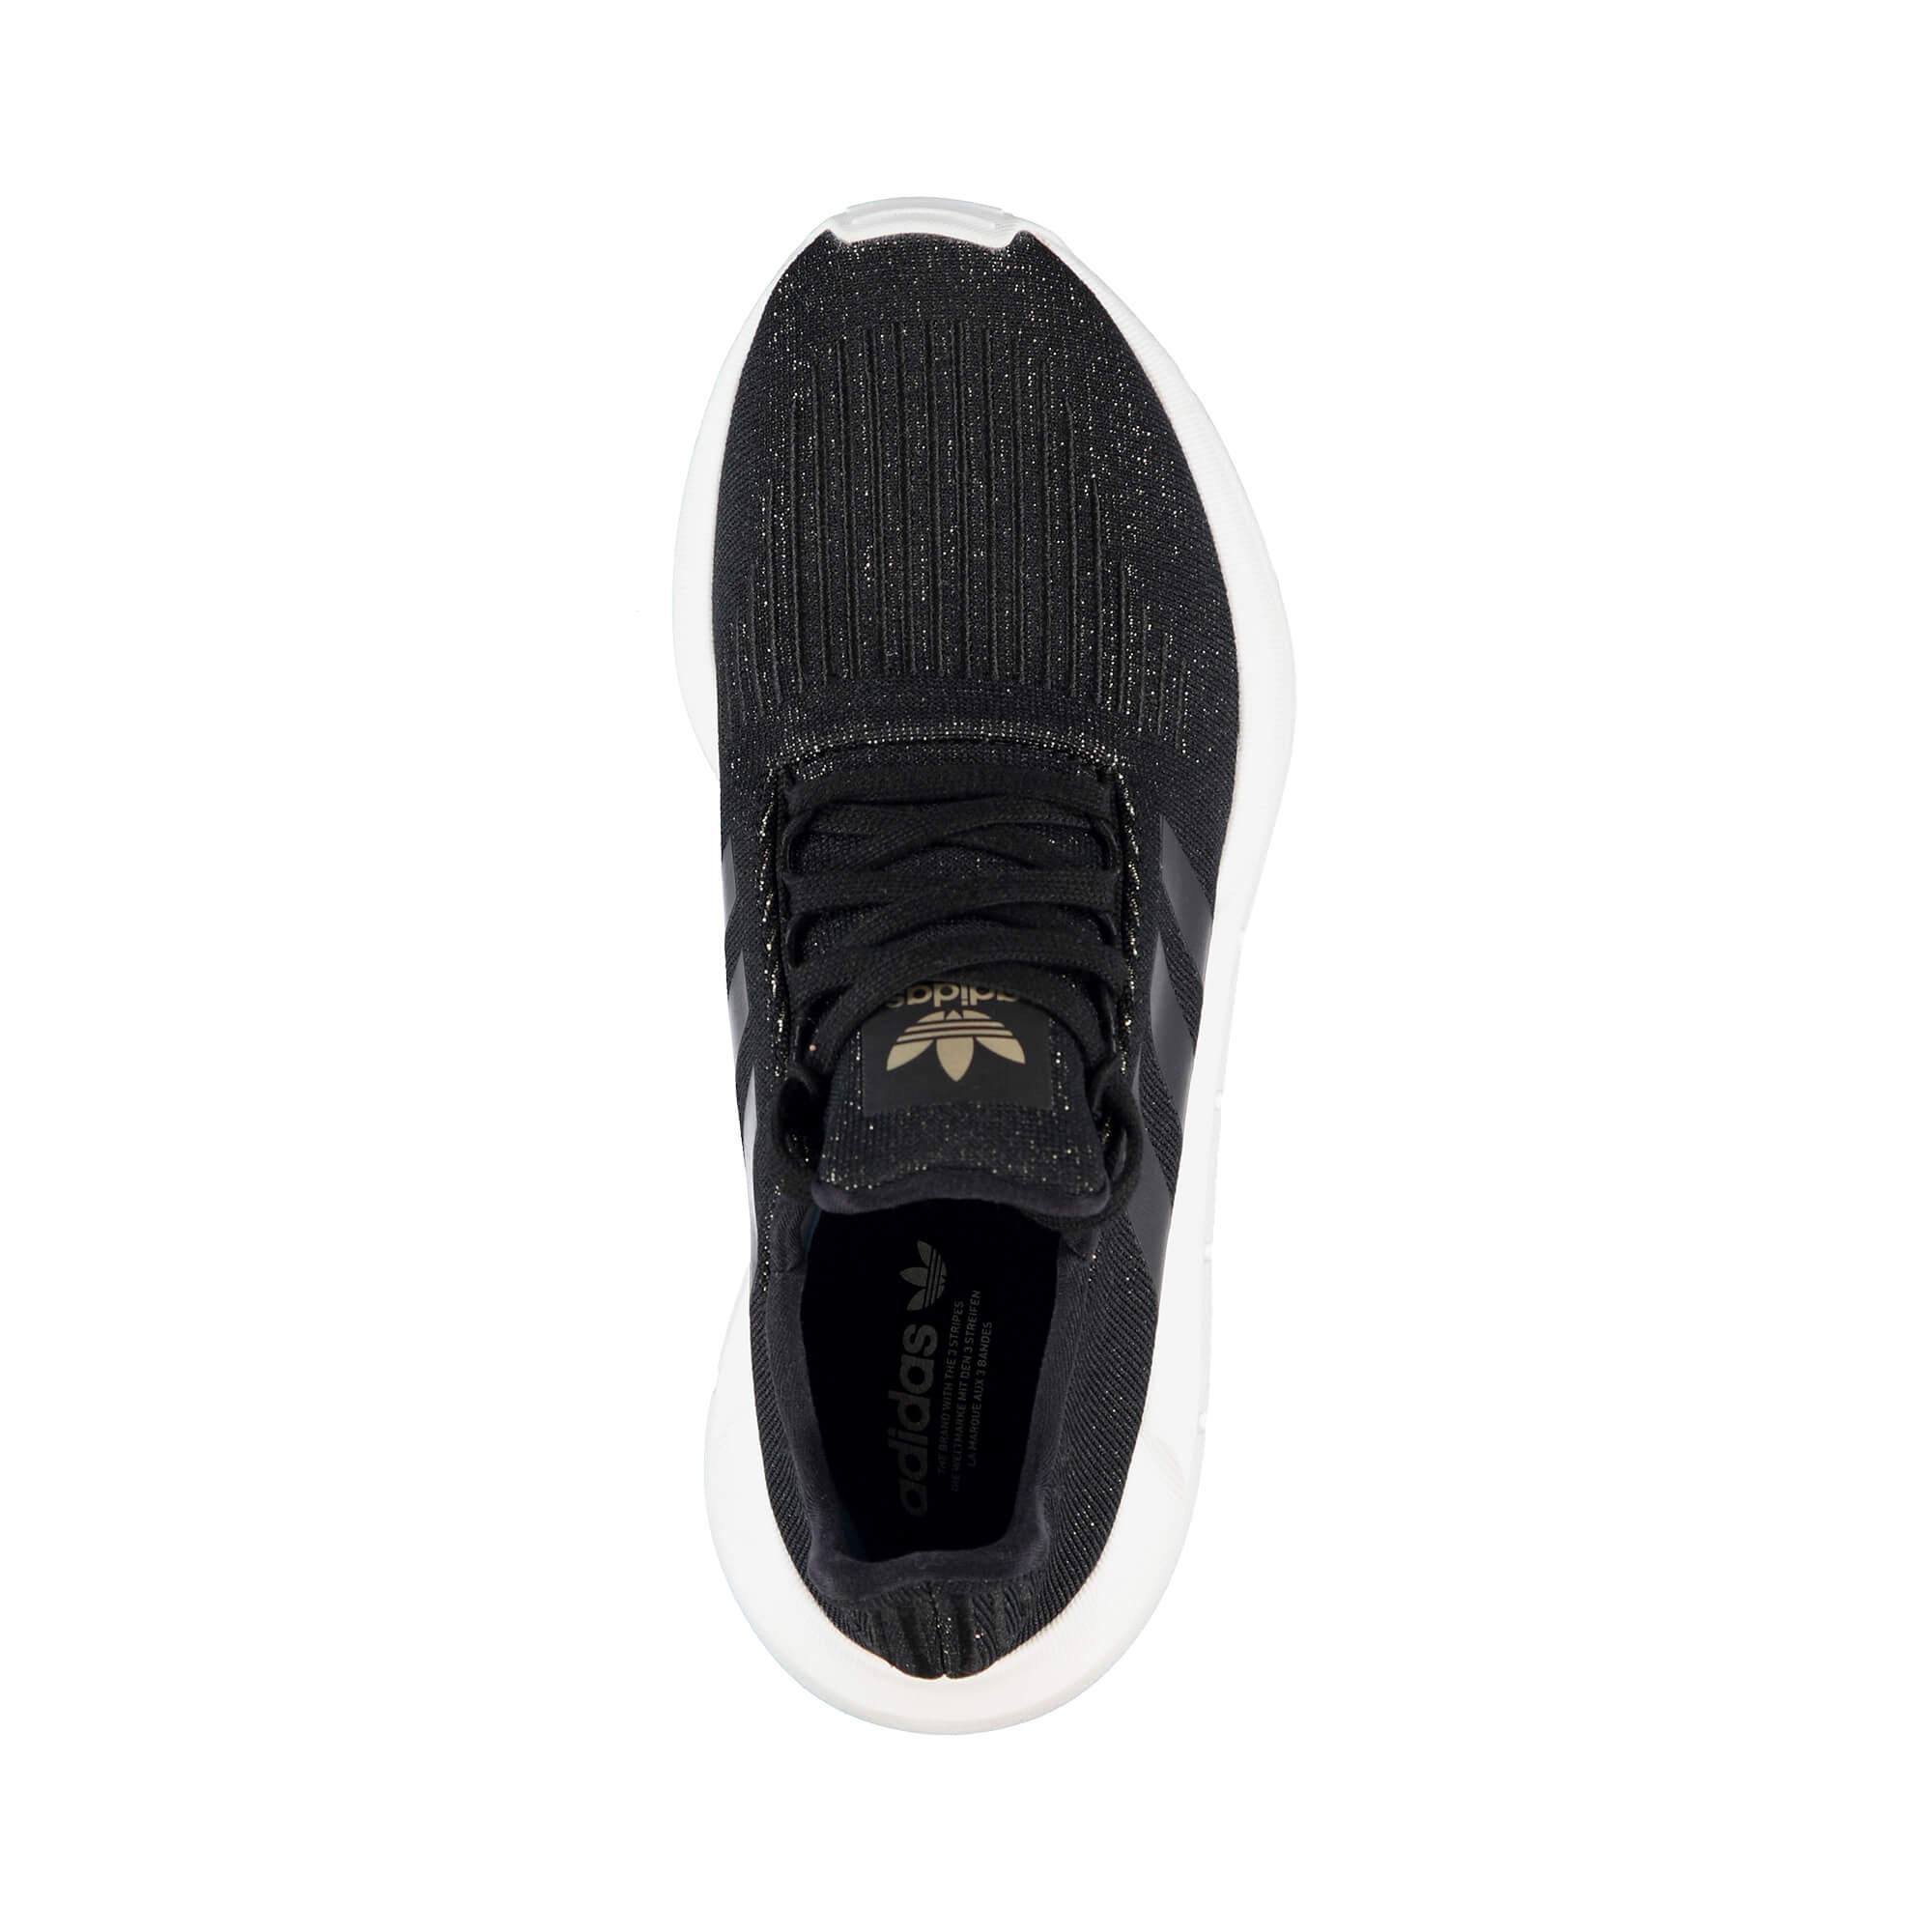 adidas Swift Run Kadın Siyah Spor Ayakkabı